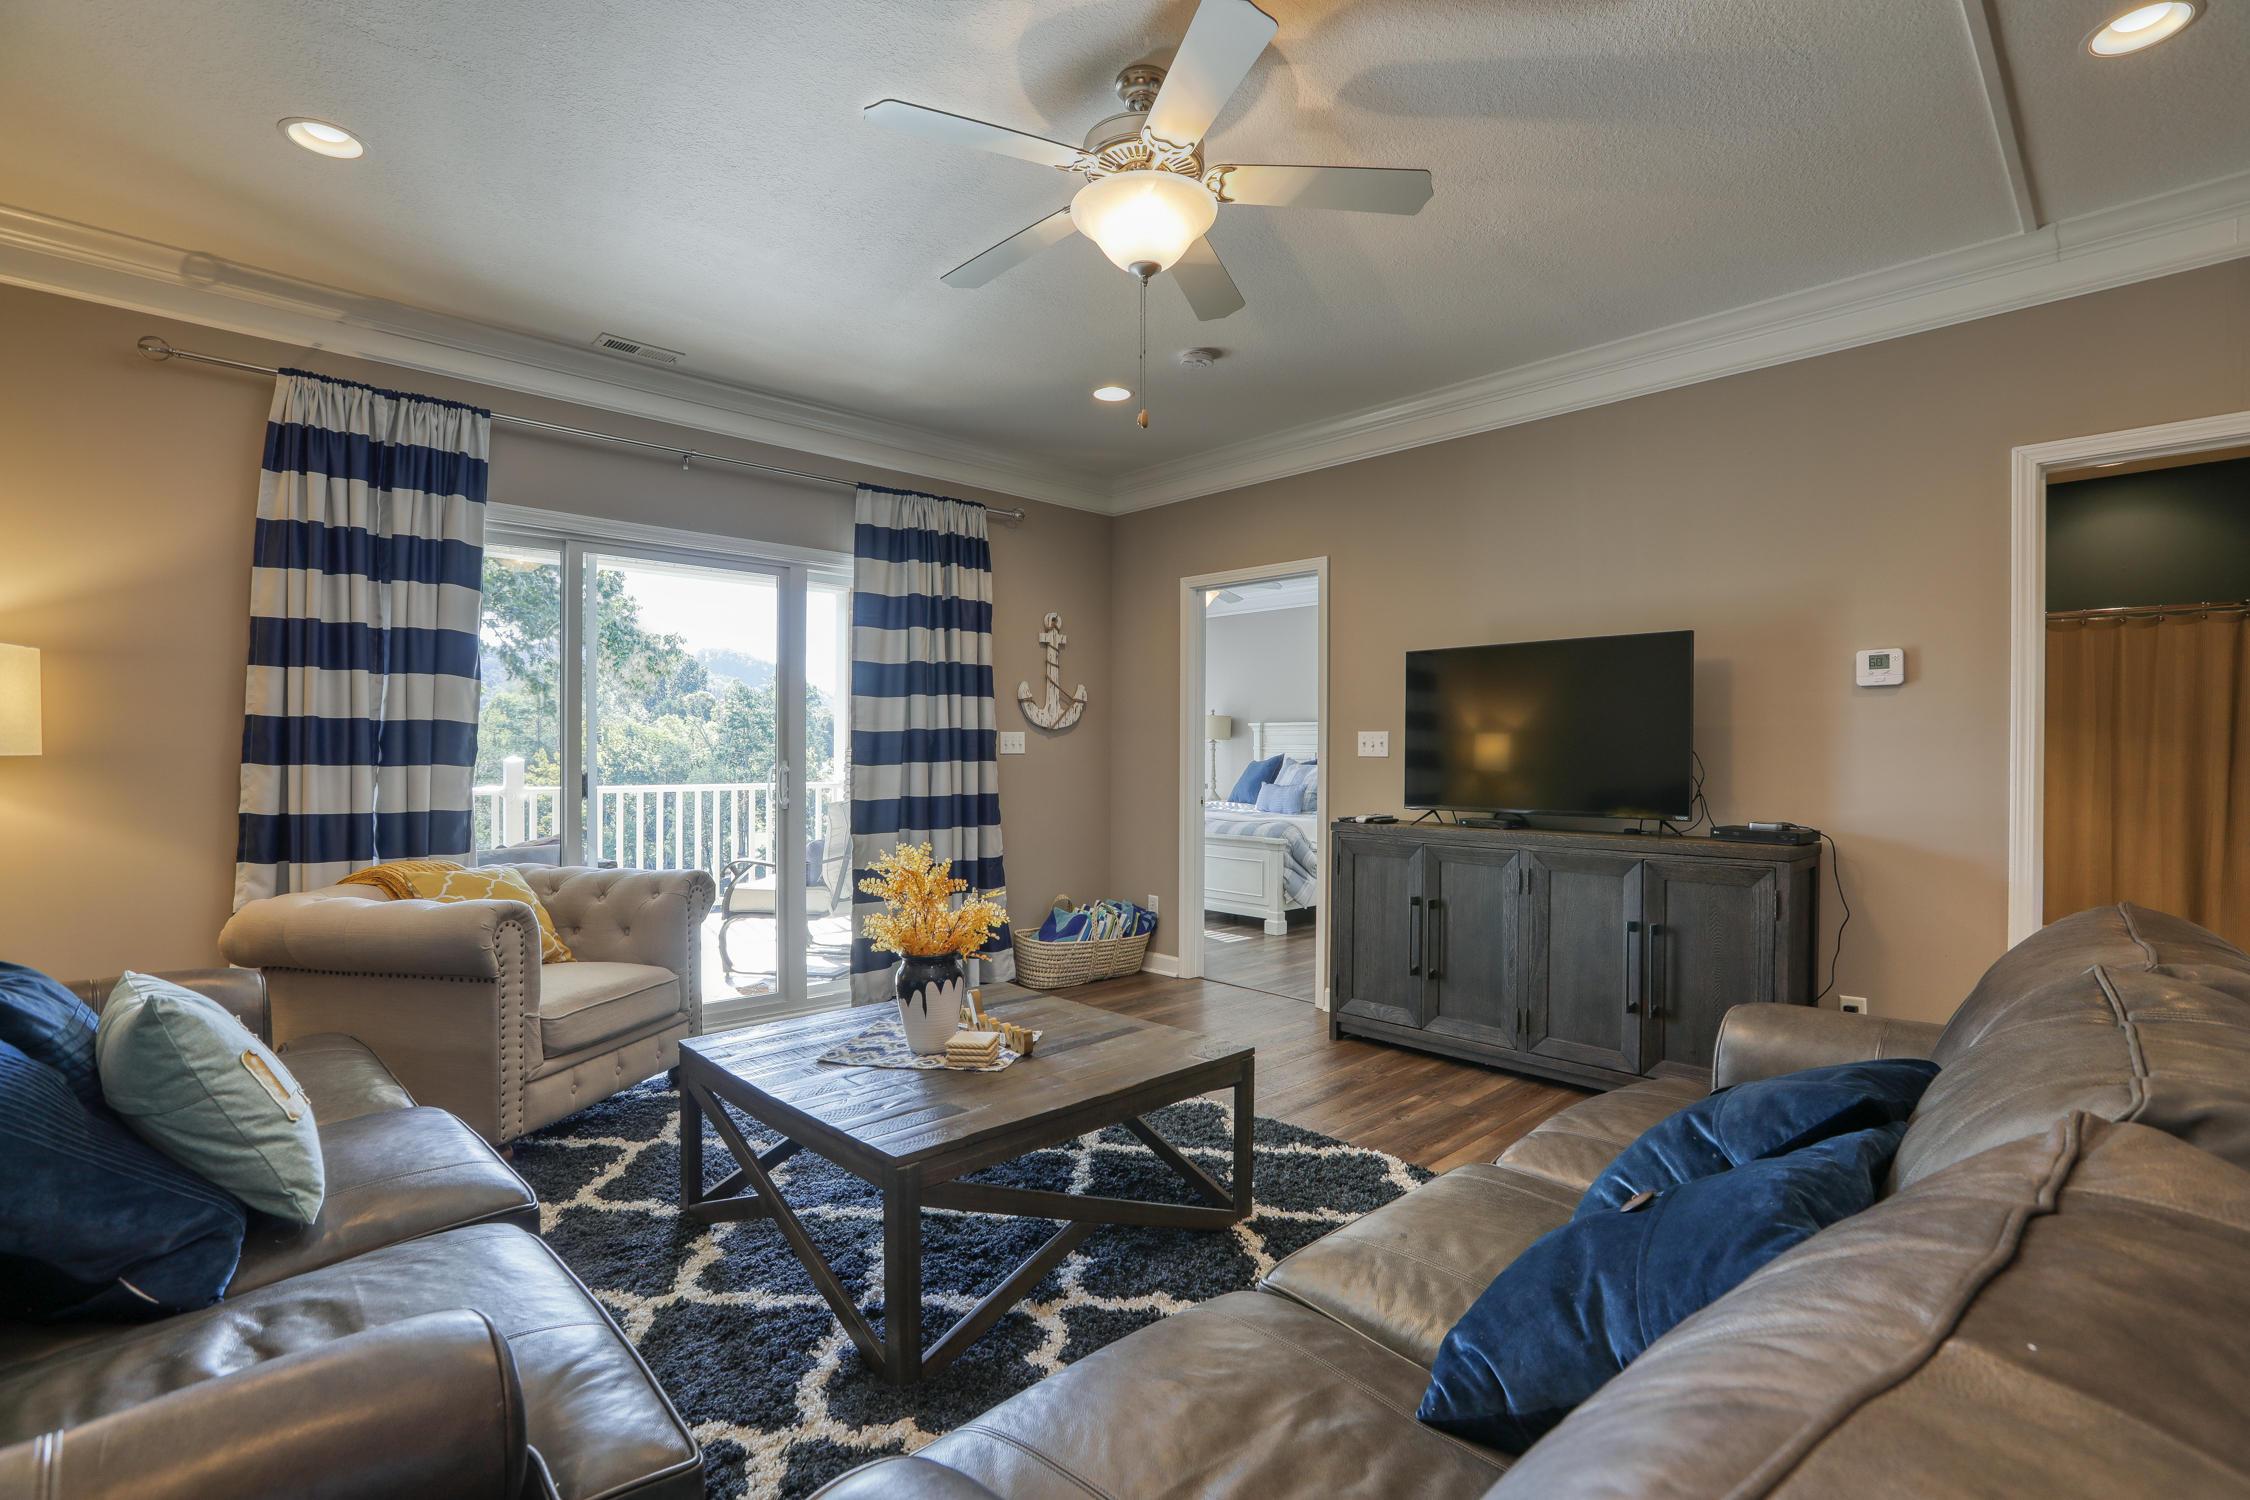 232 Sunset Cove Drive 232: